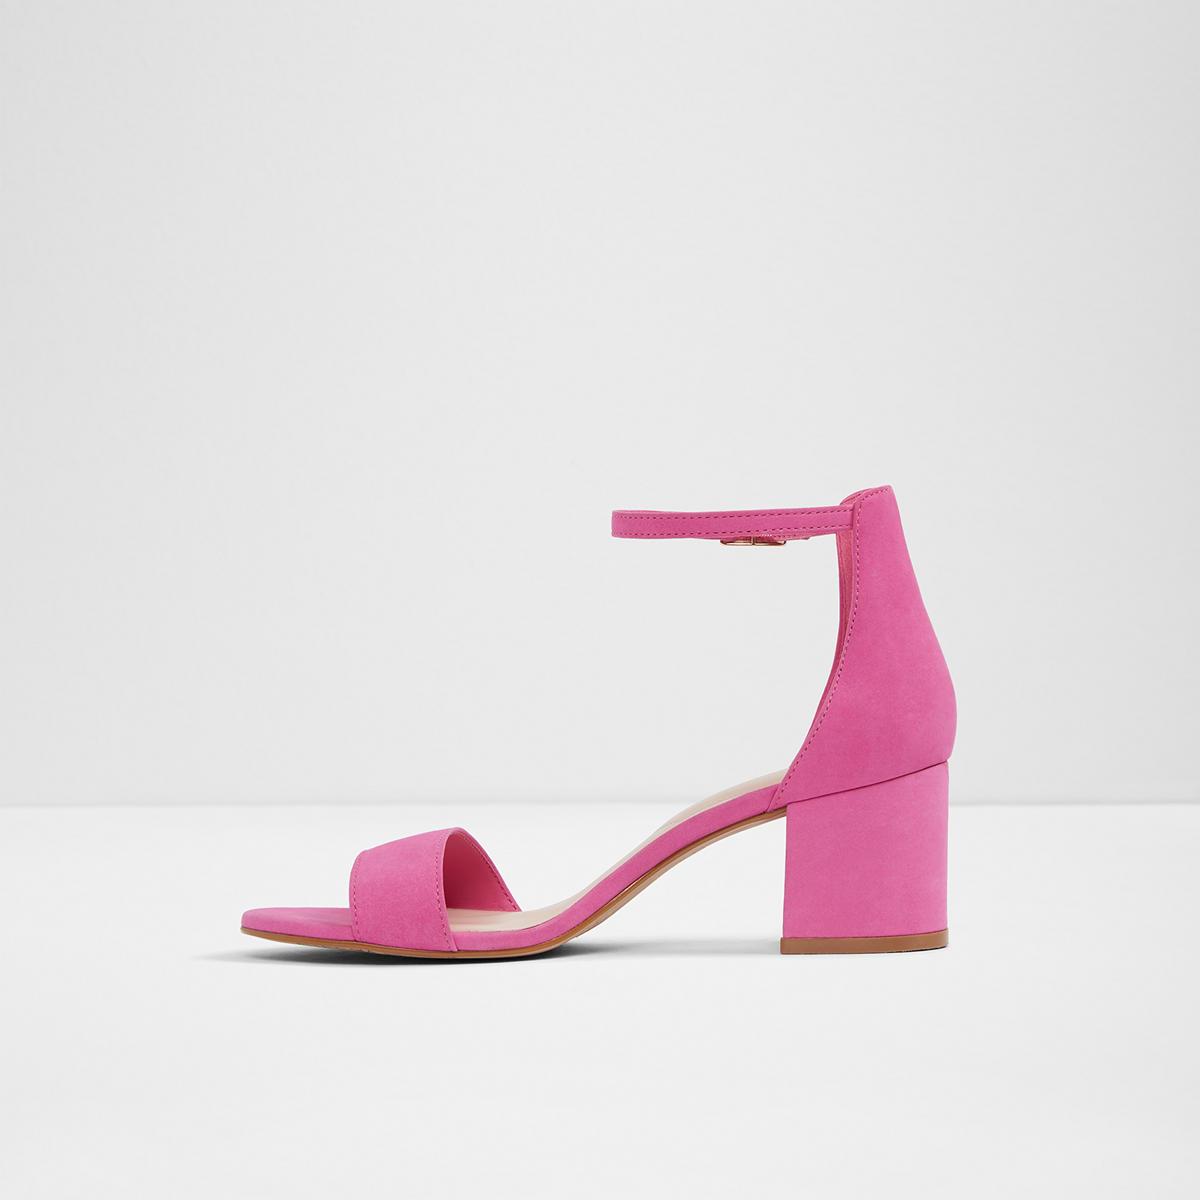 757b011ab3a Villarosa Fuschia Misc. Women s Casual heels